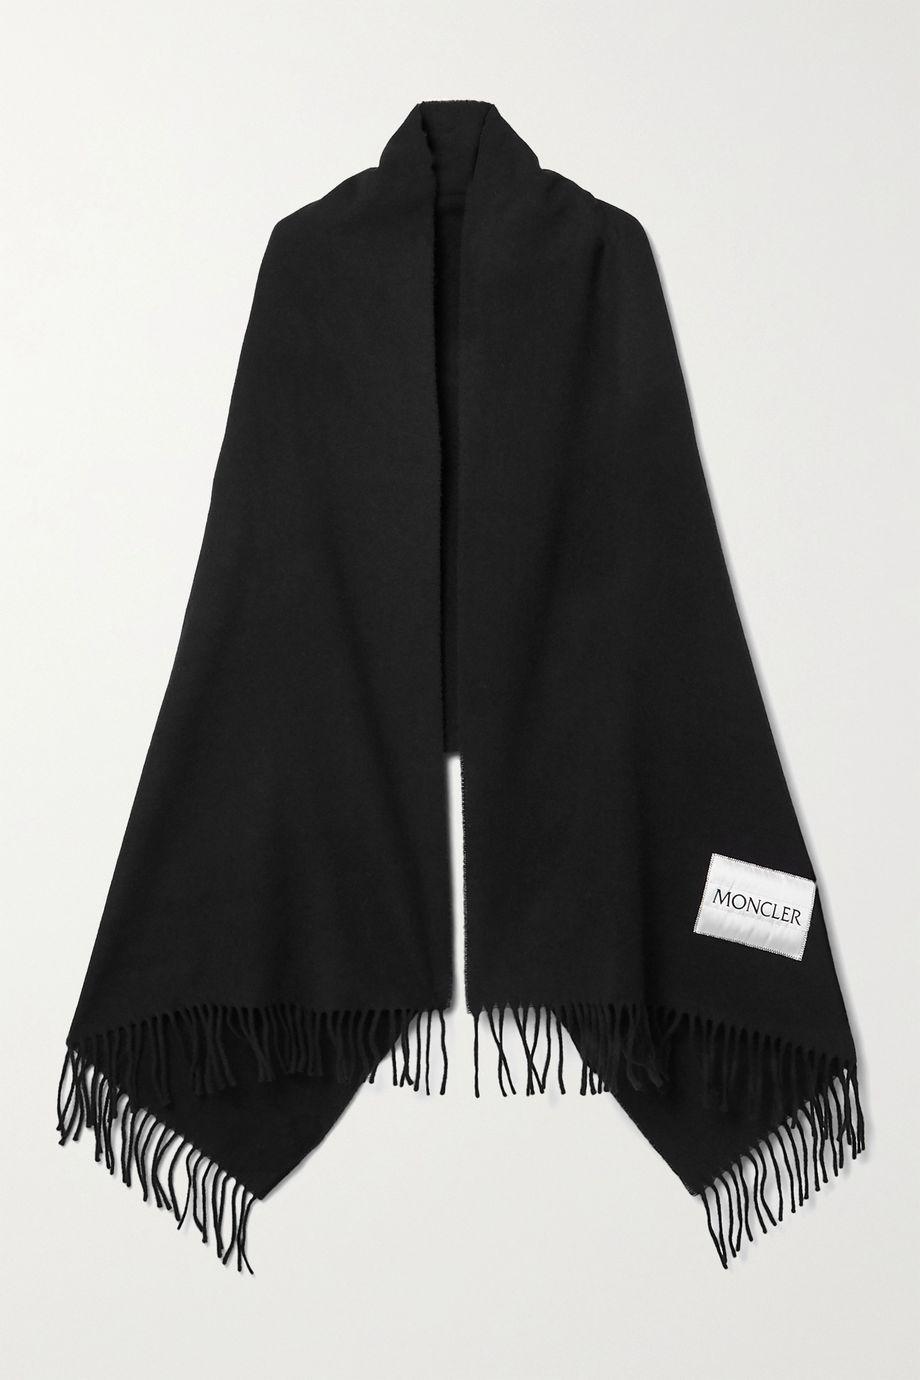 Moncler 流苏羊毛毡围巾